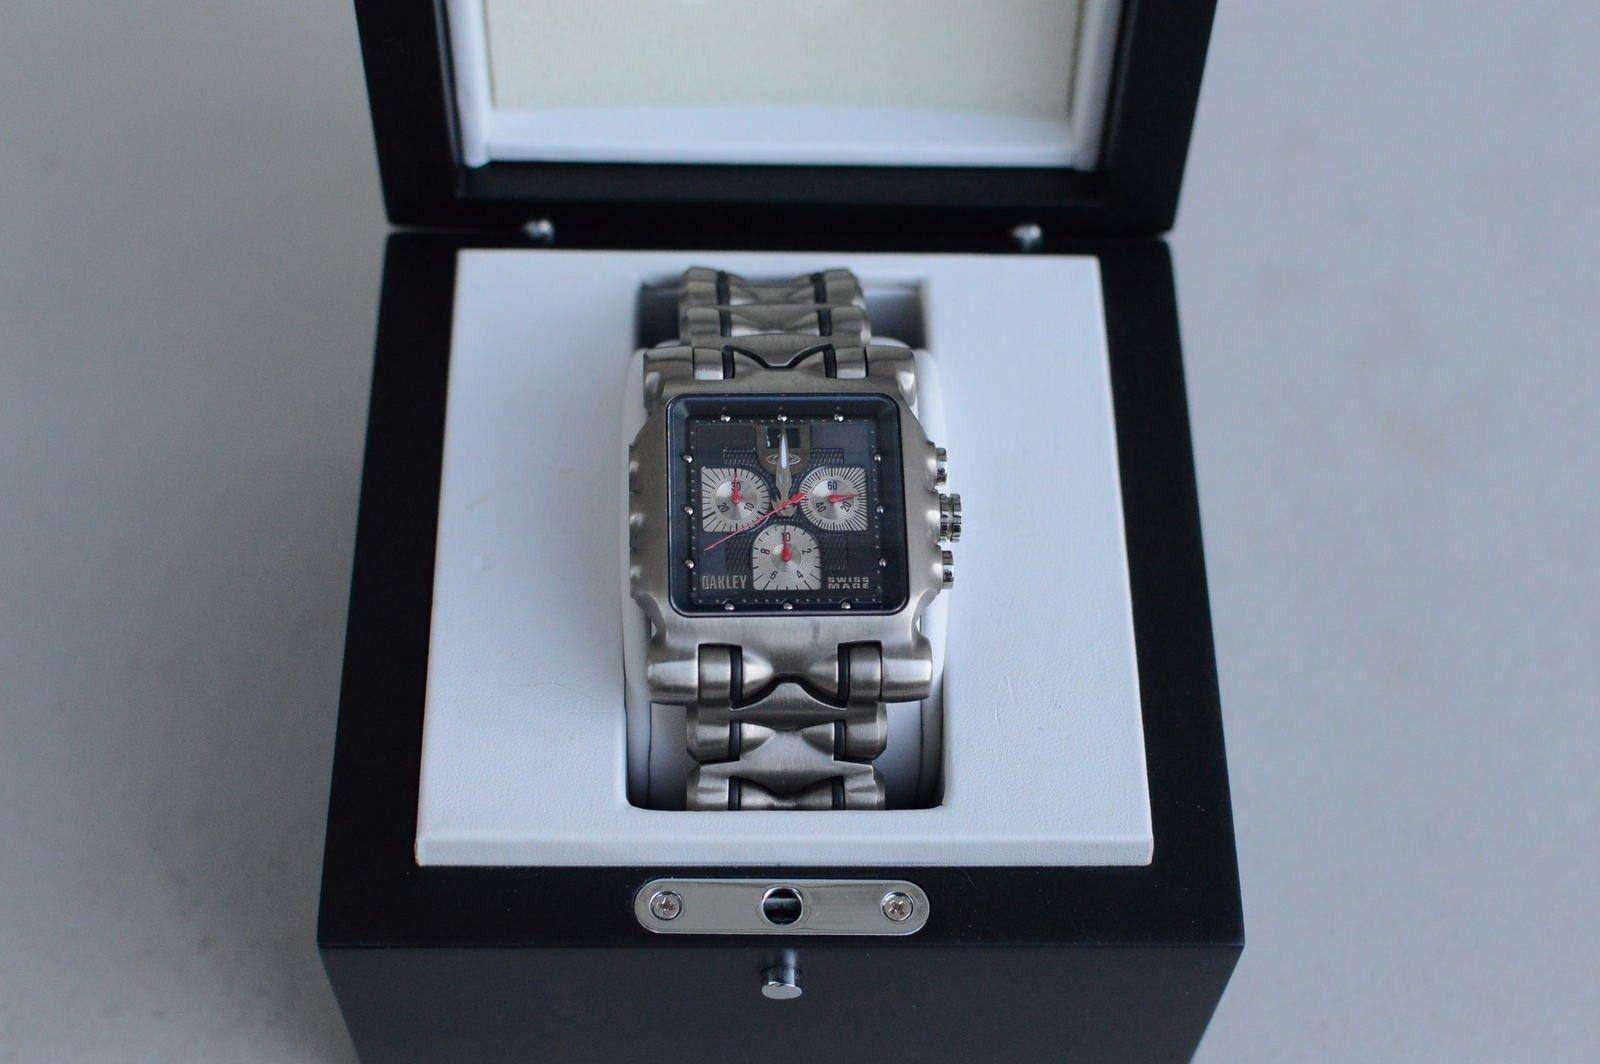 ac97886cb17 Oakley Minute Machine Watch Manual « Heritage Malta